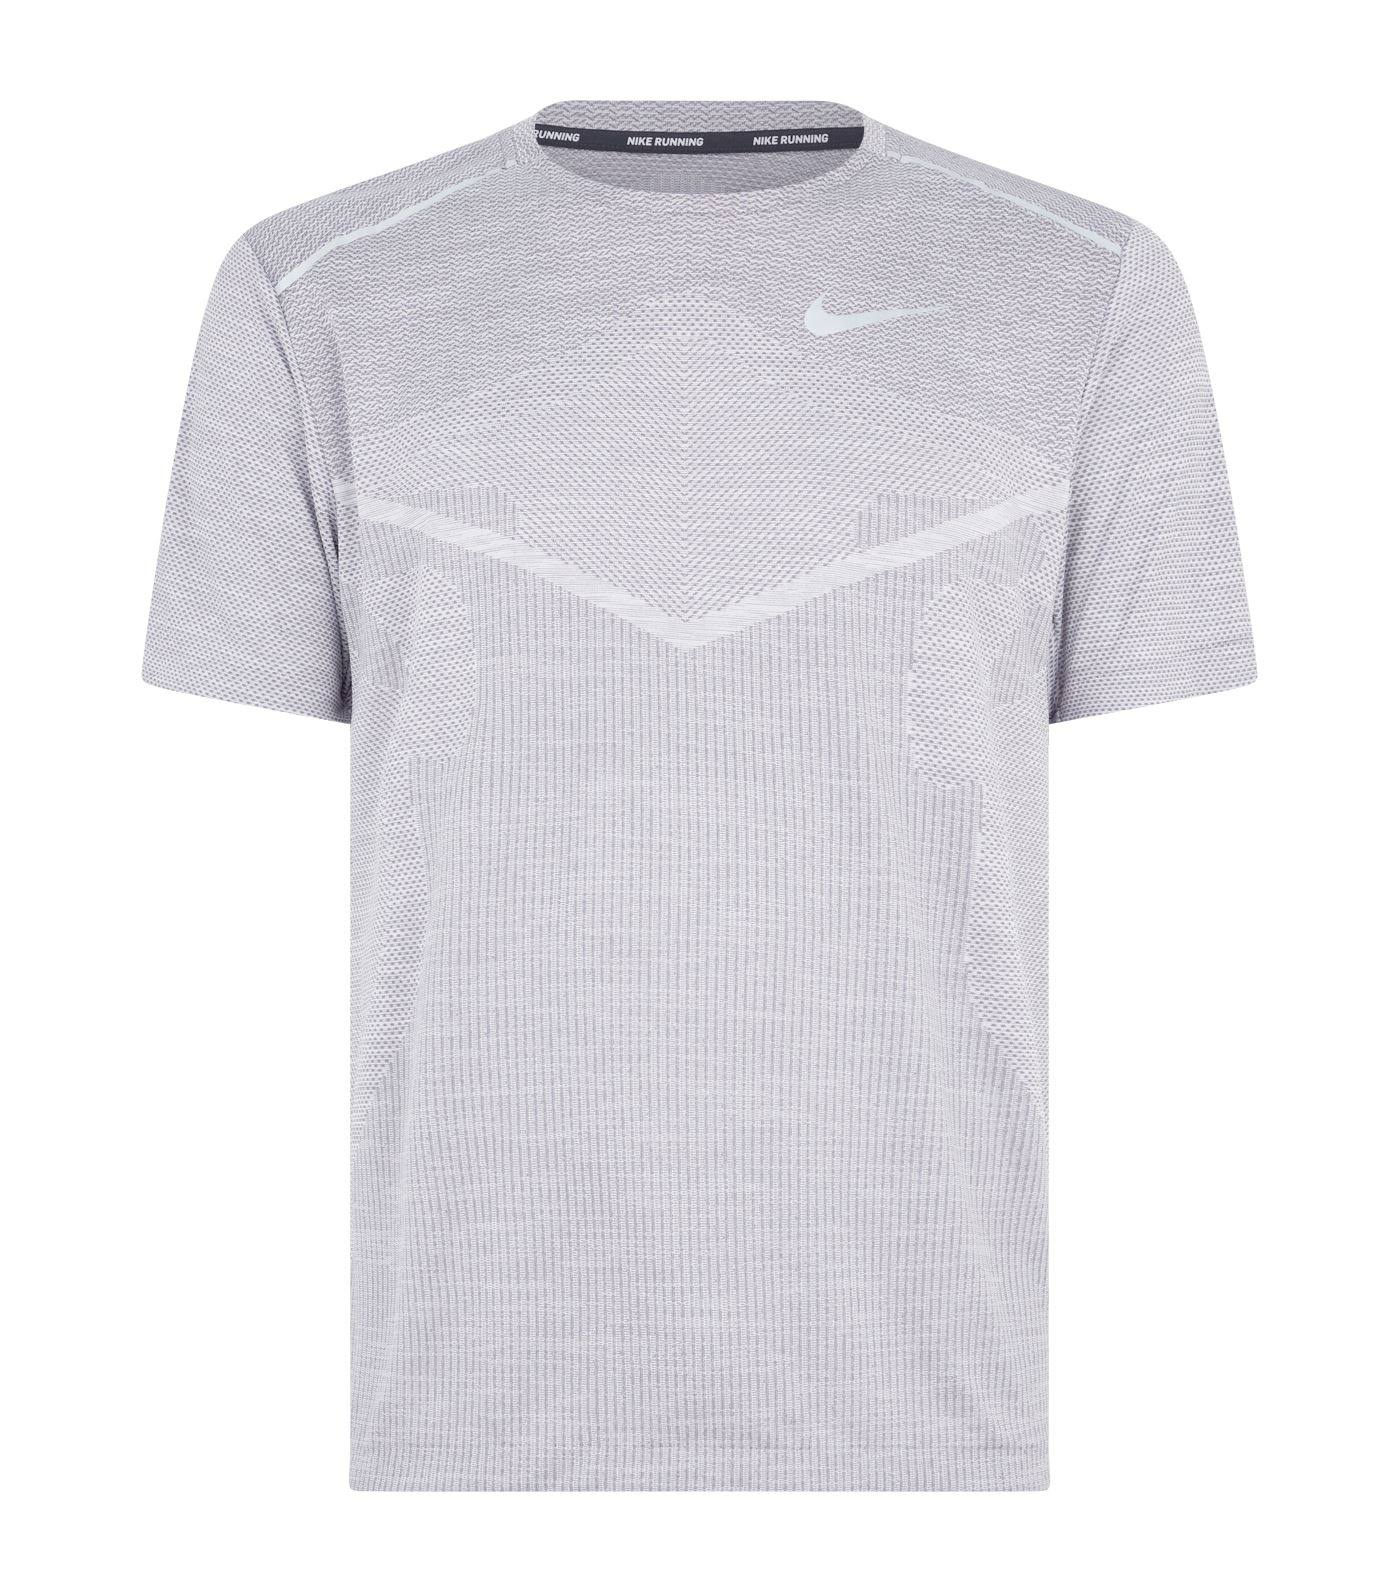 Hombre Cool Dark Ultra Nike Techknit grey Camiseta xIqP0z